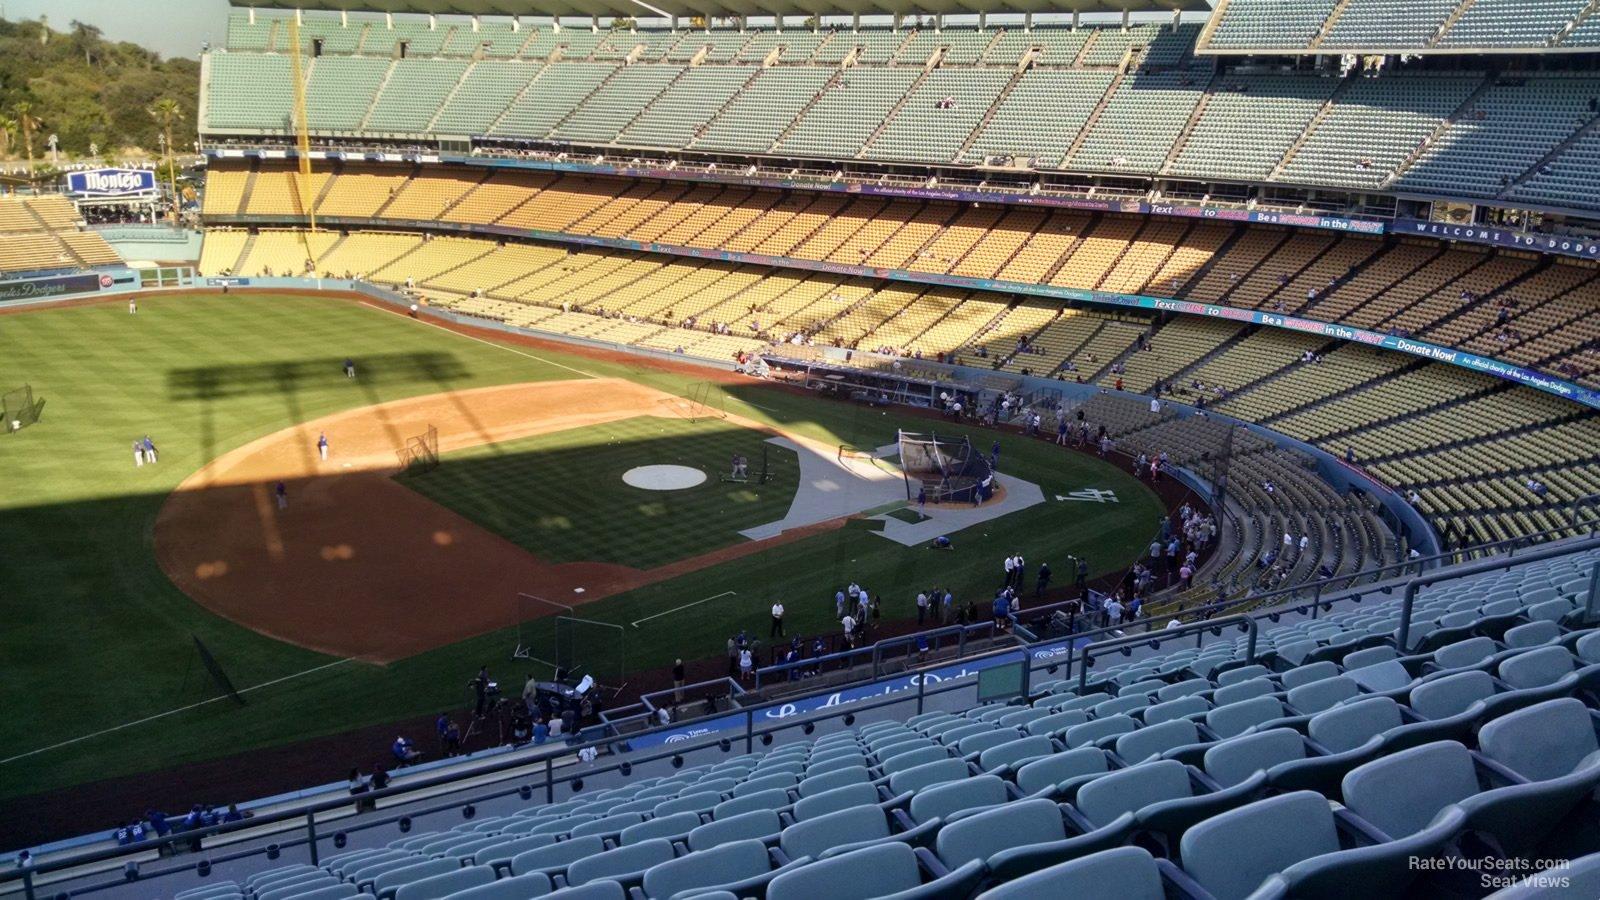 Dodger Stadium Lower Reserve 27 - RateYourSeats.com